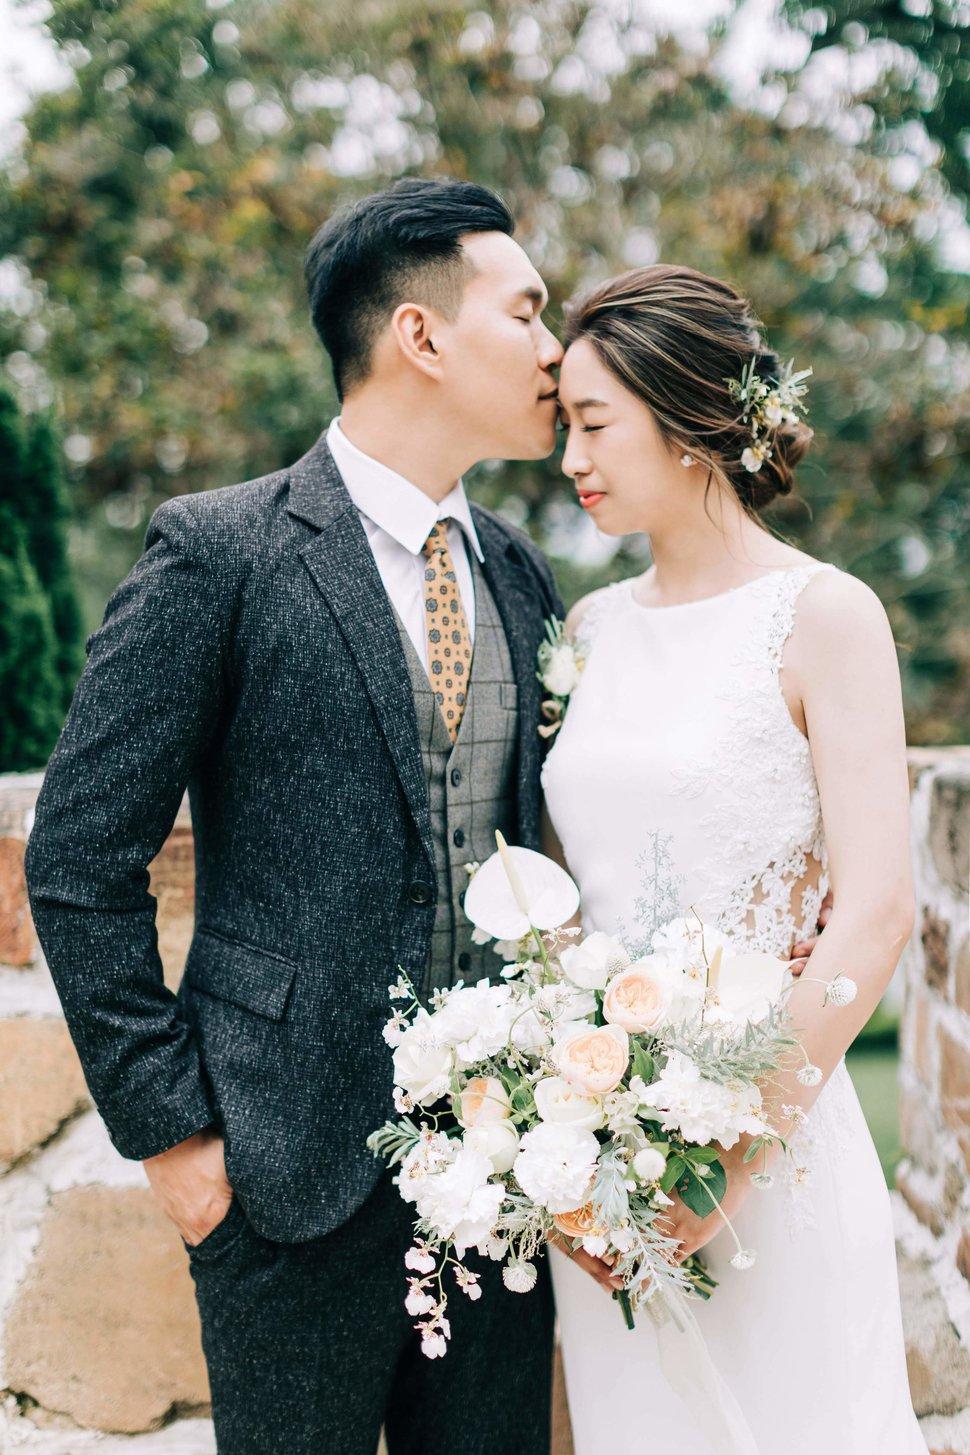 AG3_6434A - Cradle Wedding搖籃手工婚紗《結婚吧》